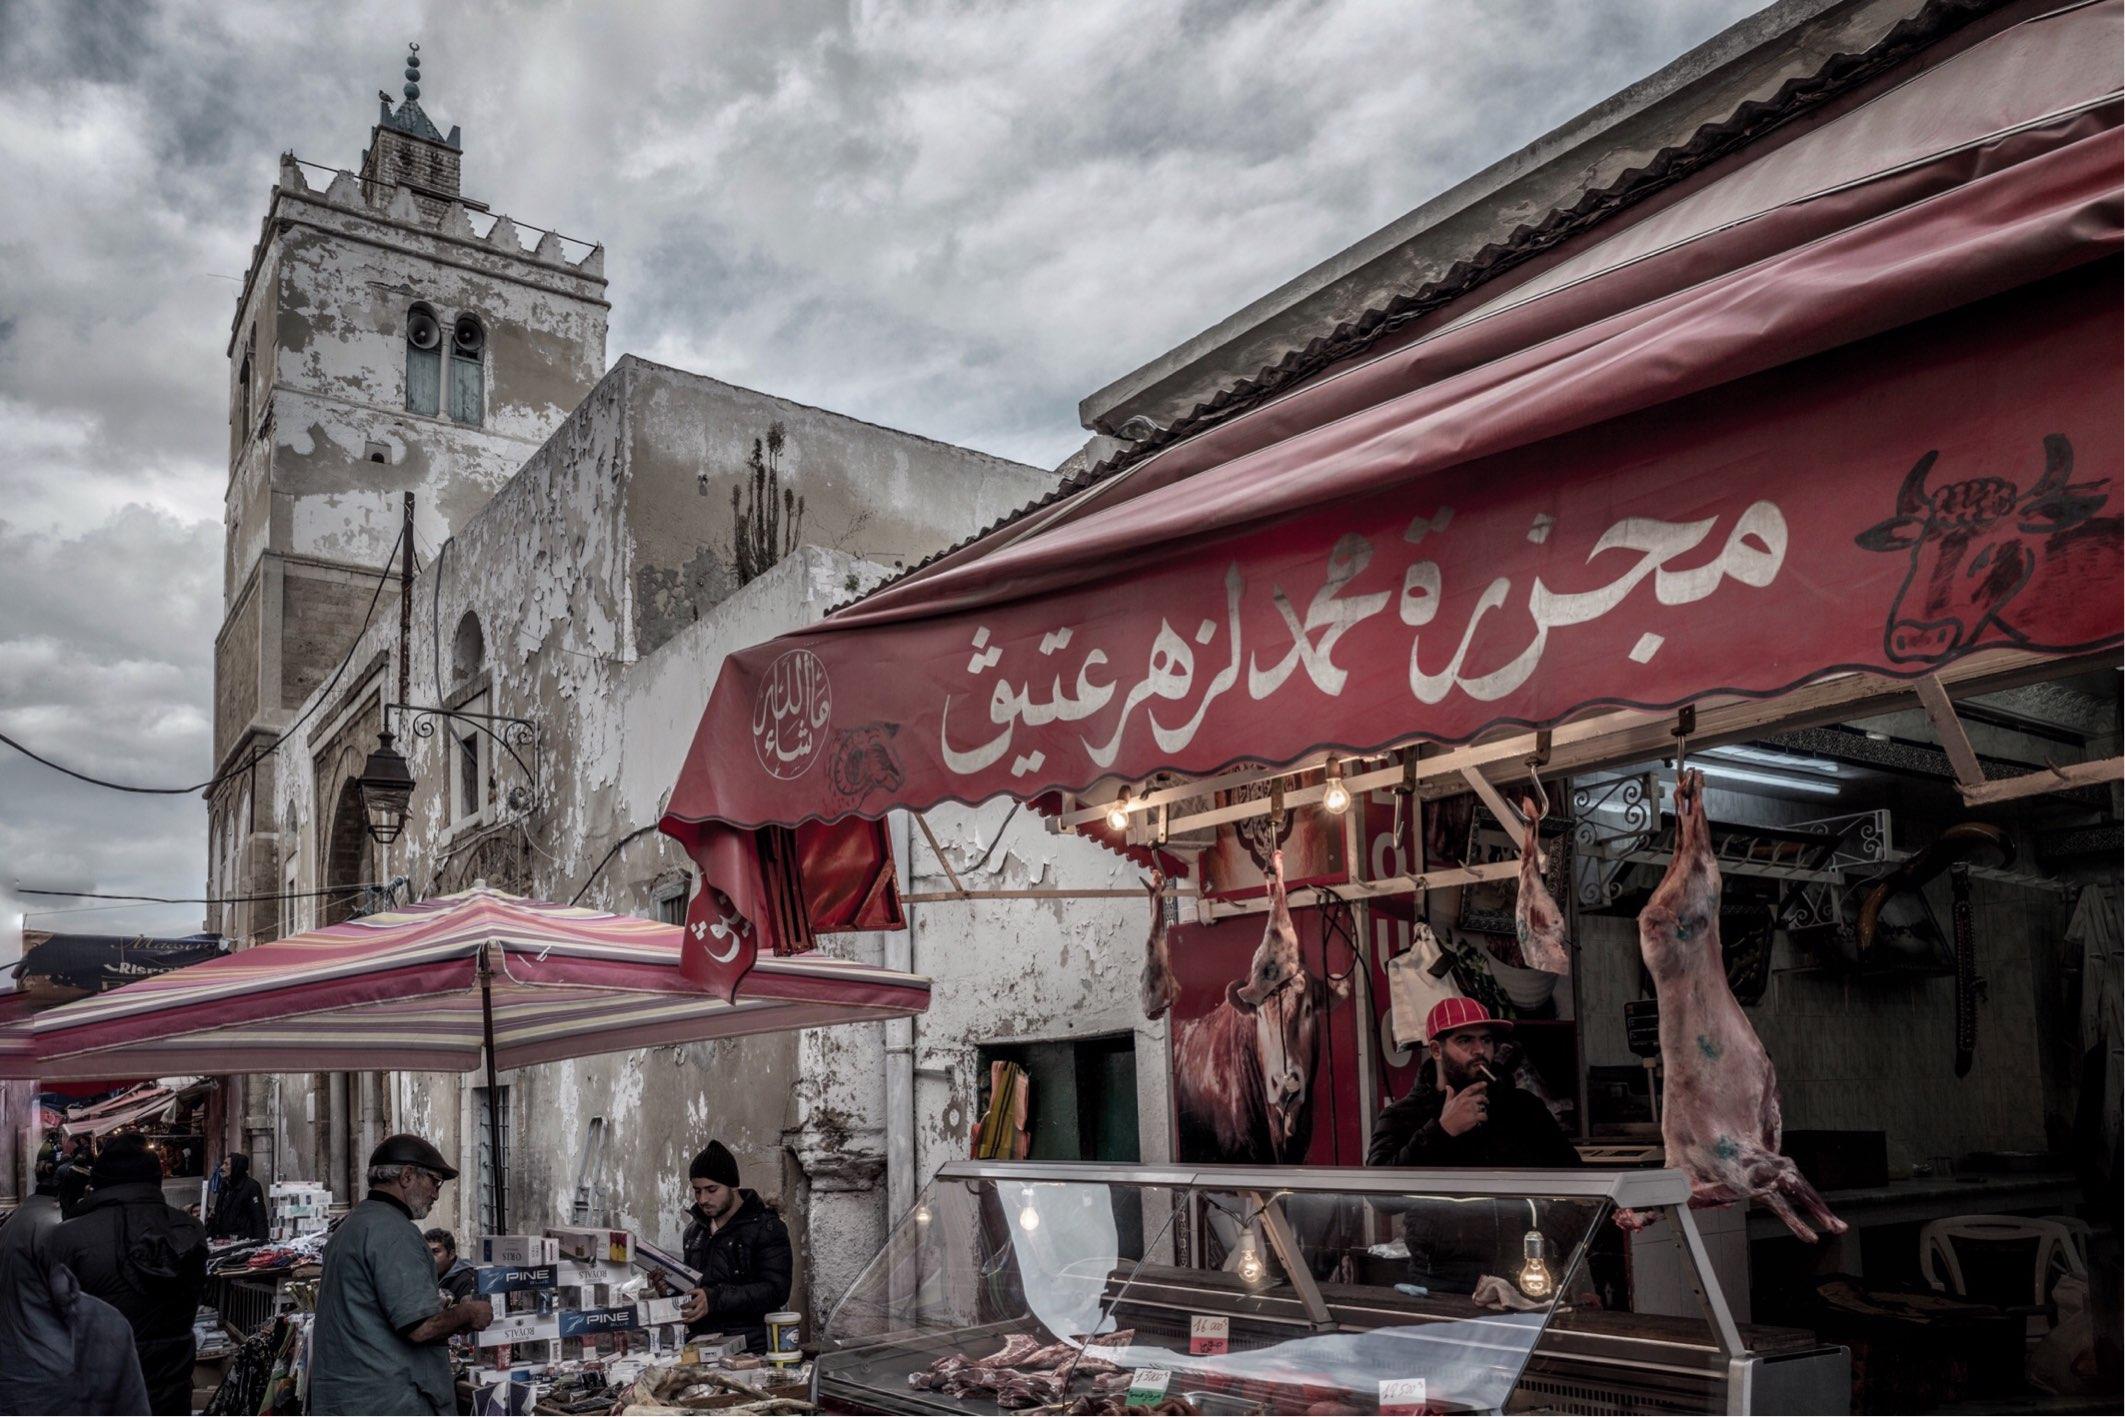 At the Meat Markets, Medina de Tunis.